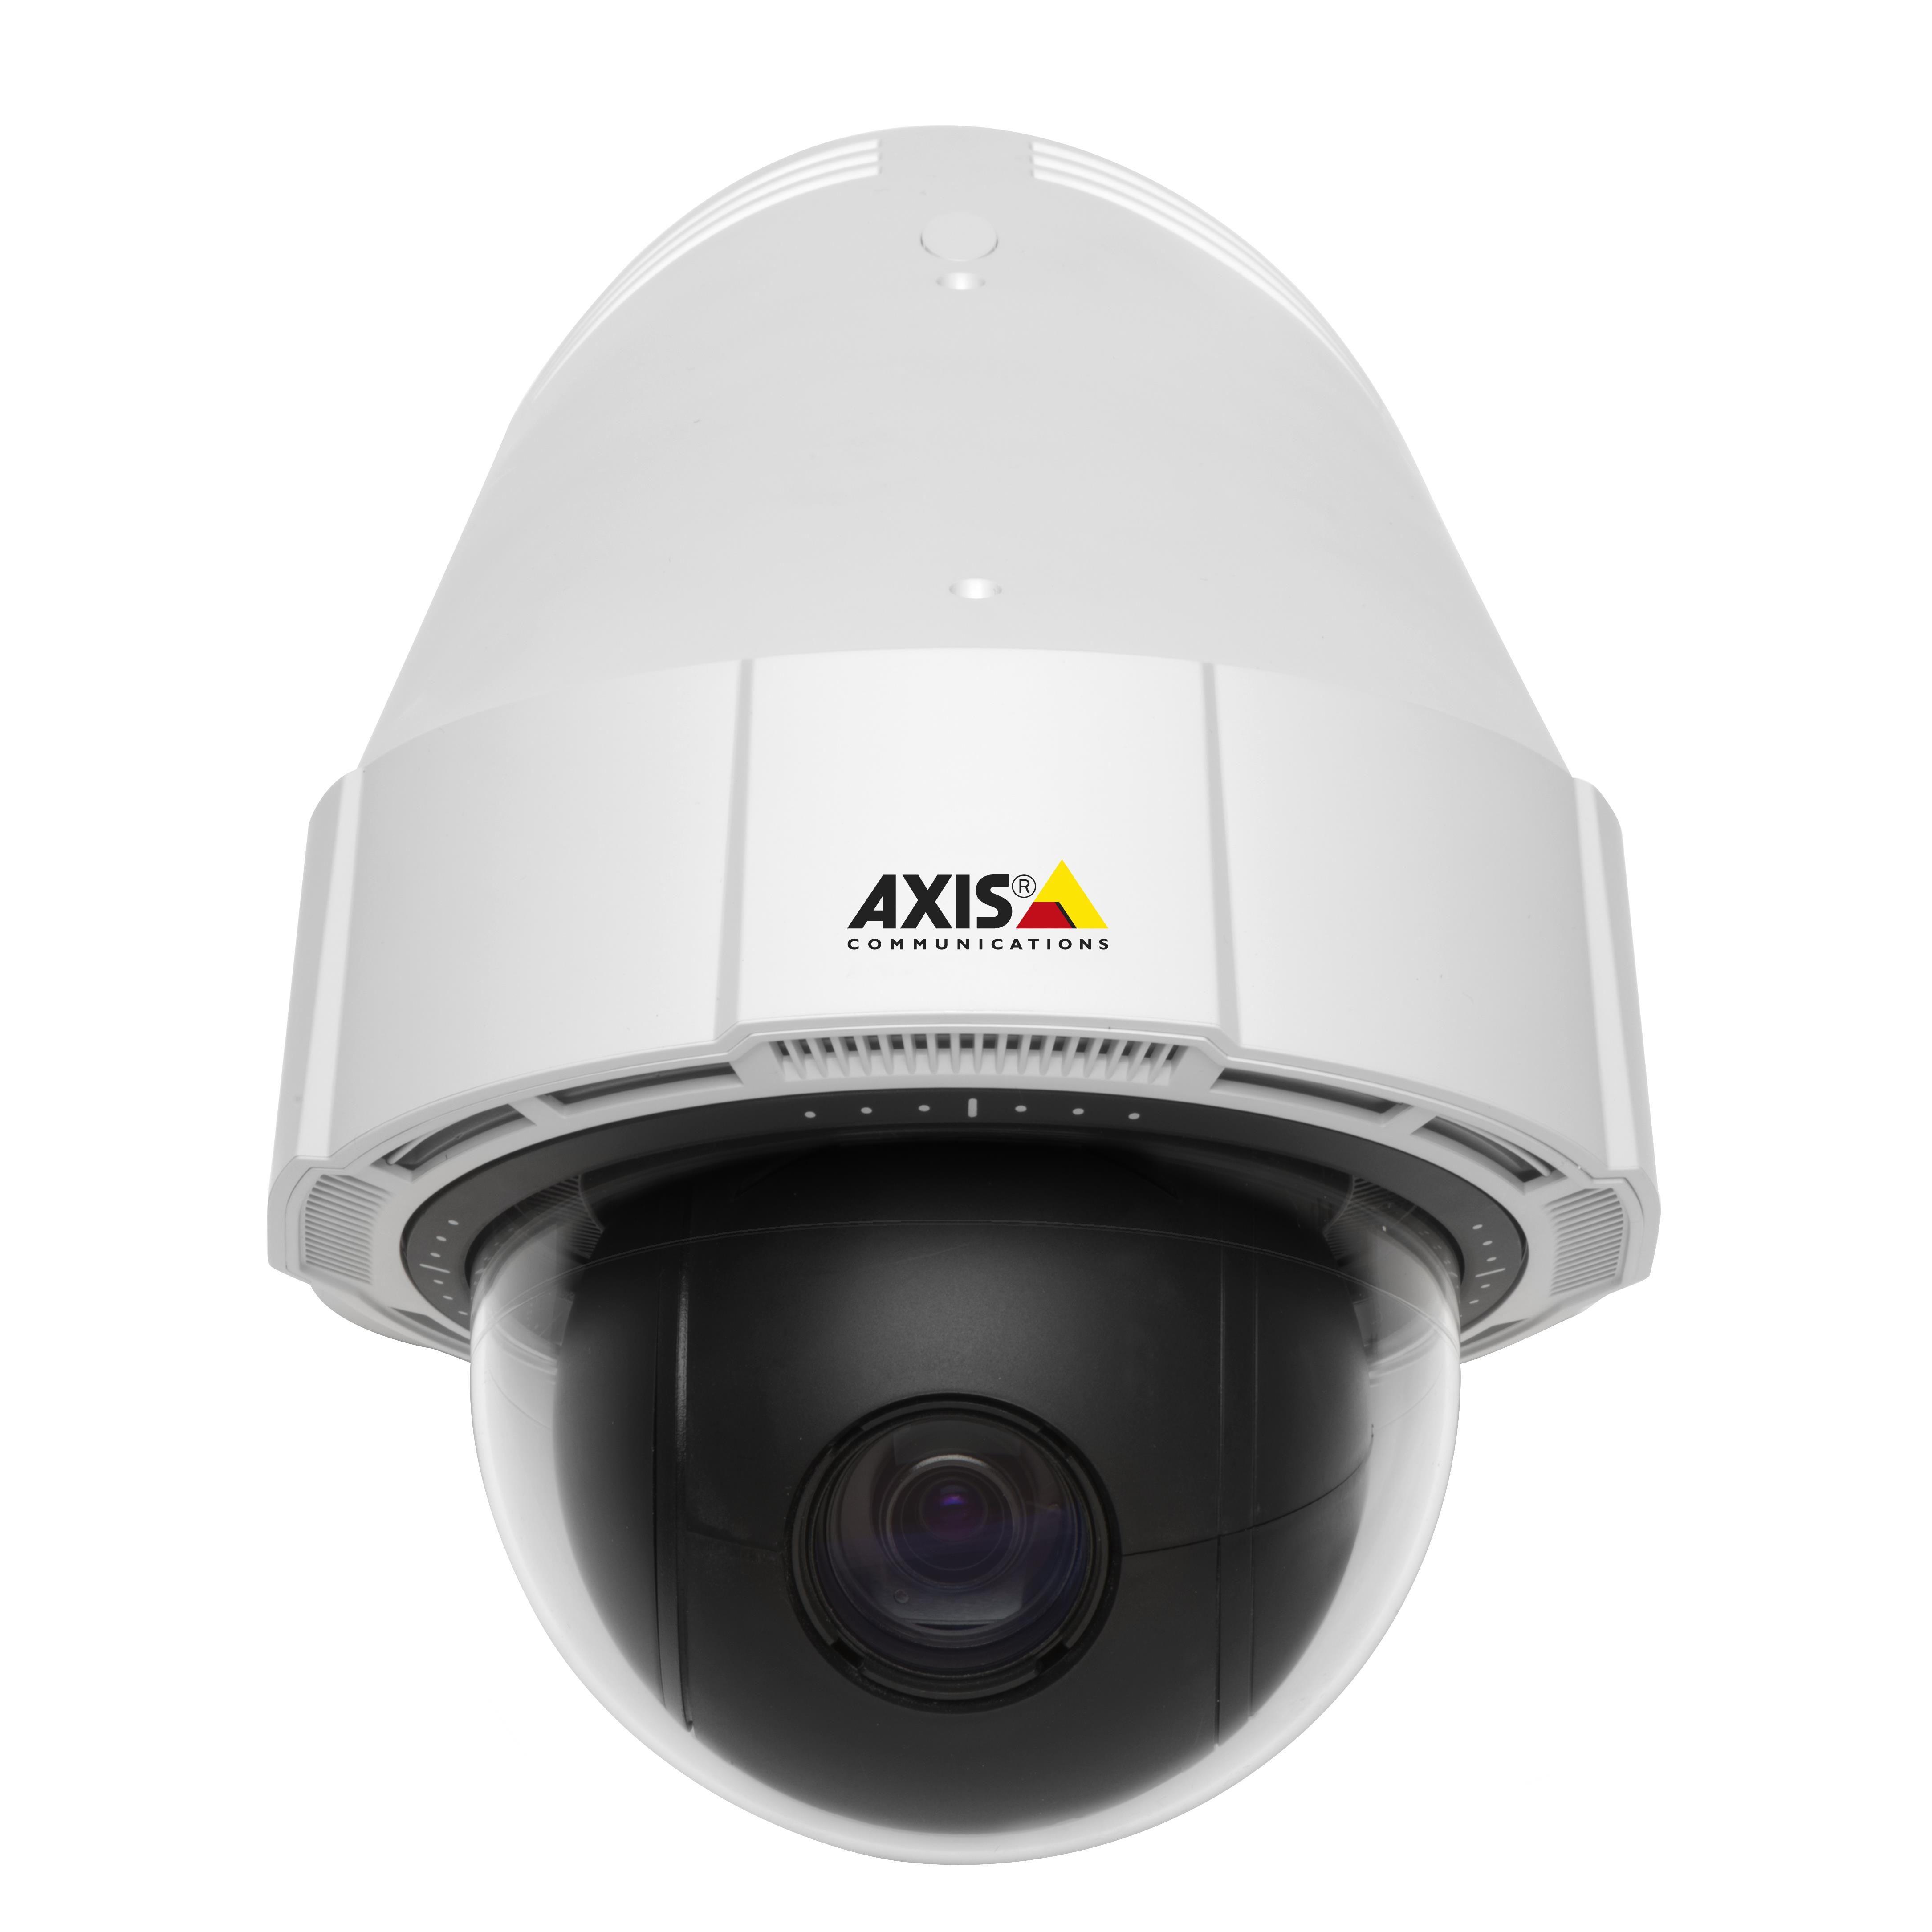 Axis P5415-e Ptz Hdtv1080 Zoom 18x